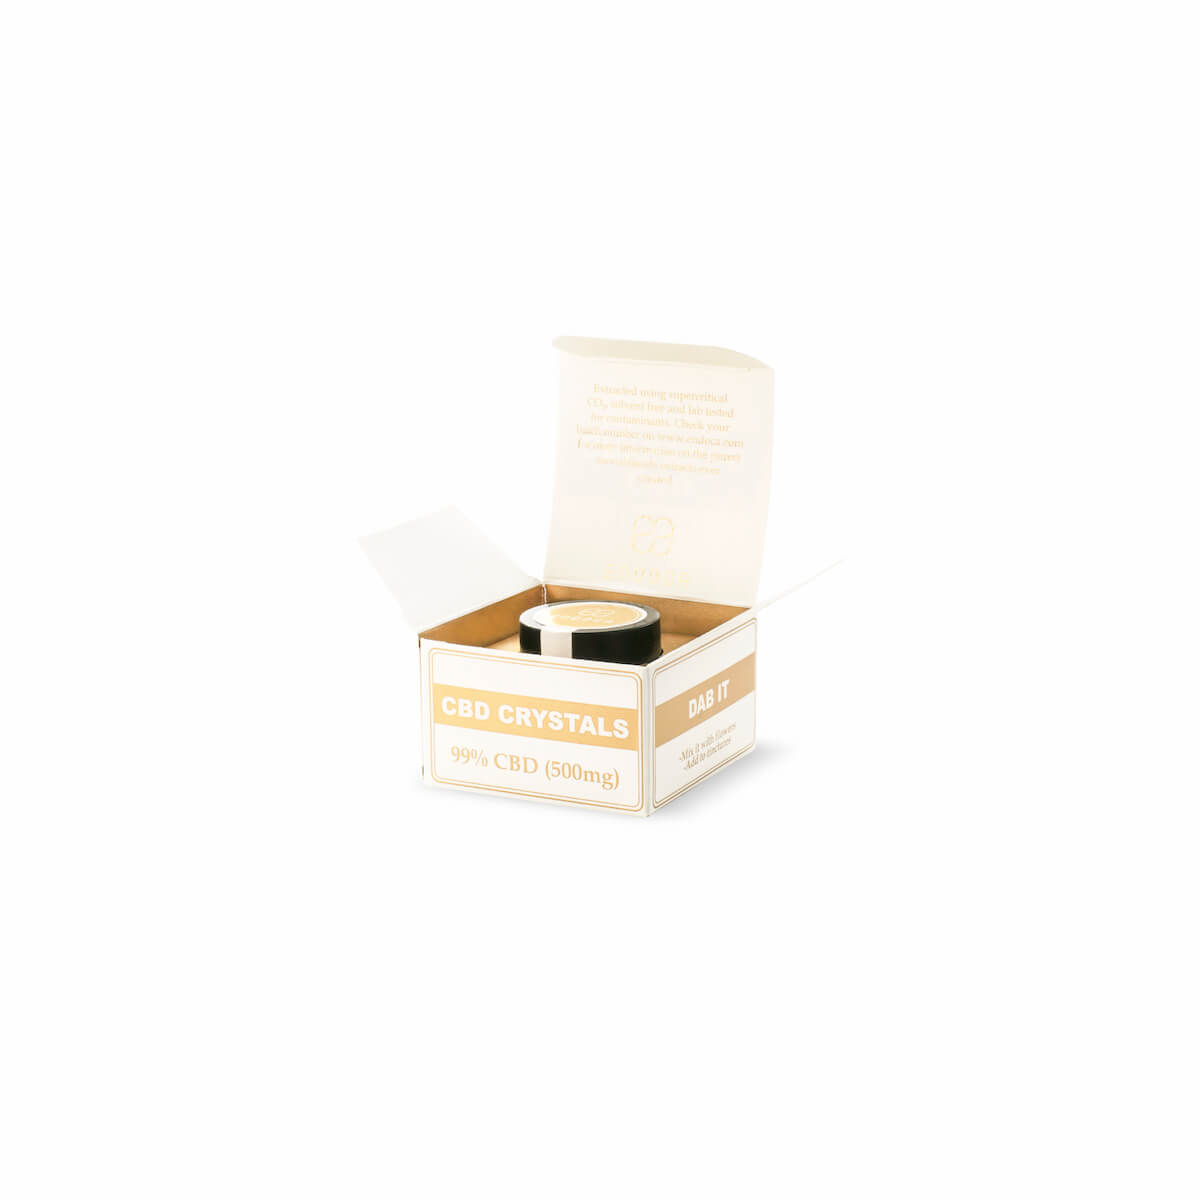 cbd crystals box